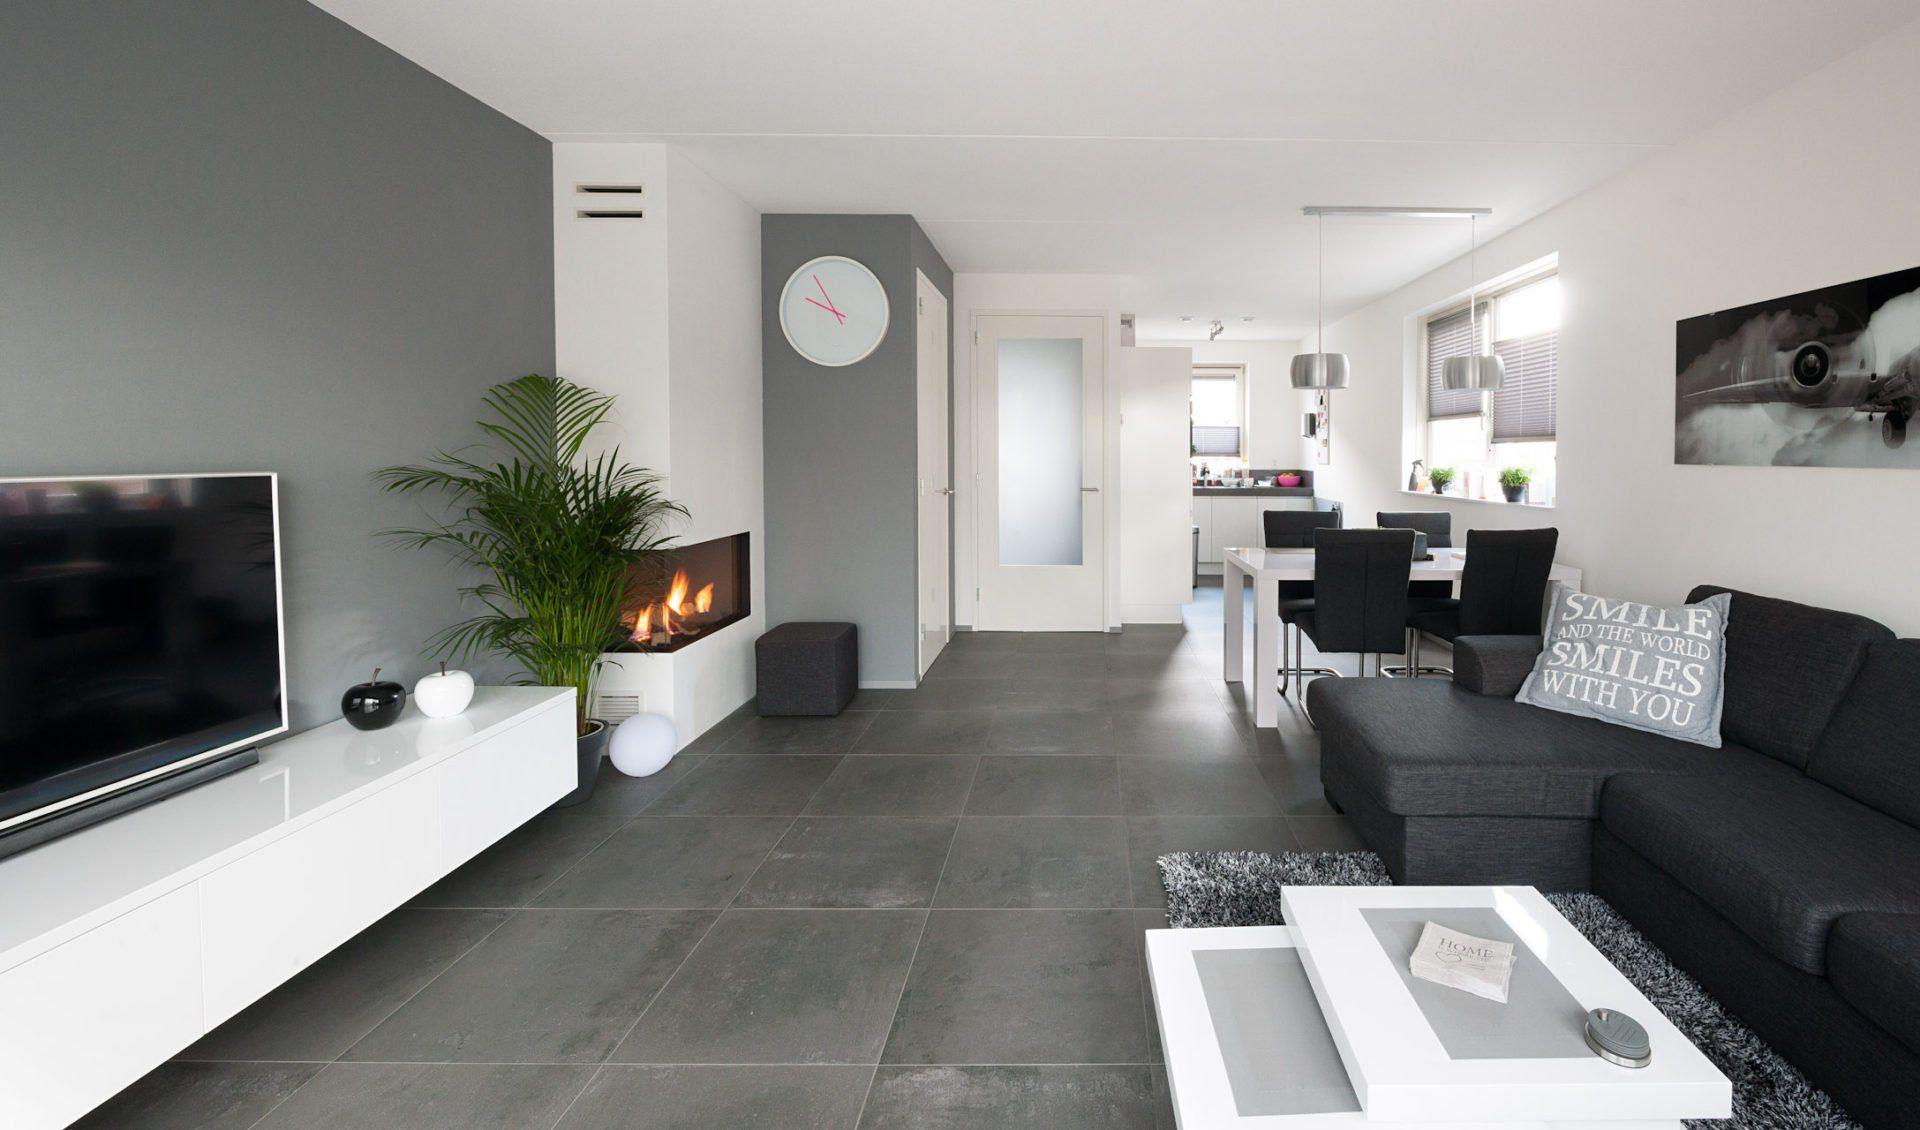 Vloertegels woonkamer  KROON vloeren in Steen